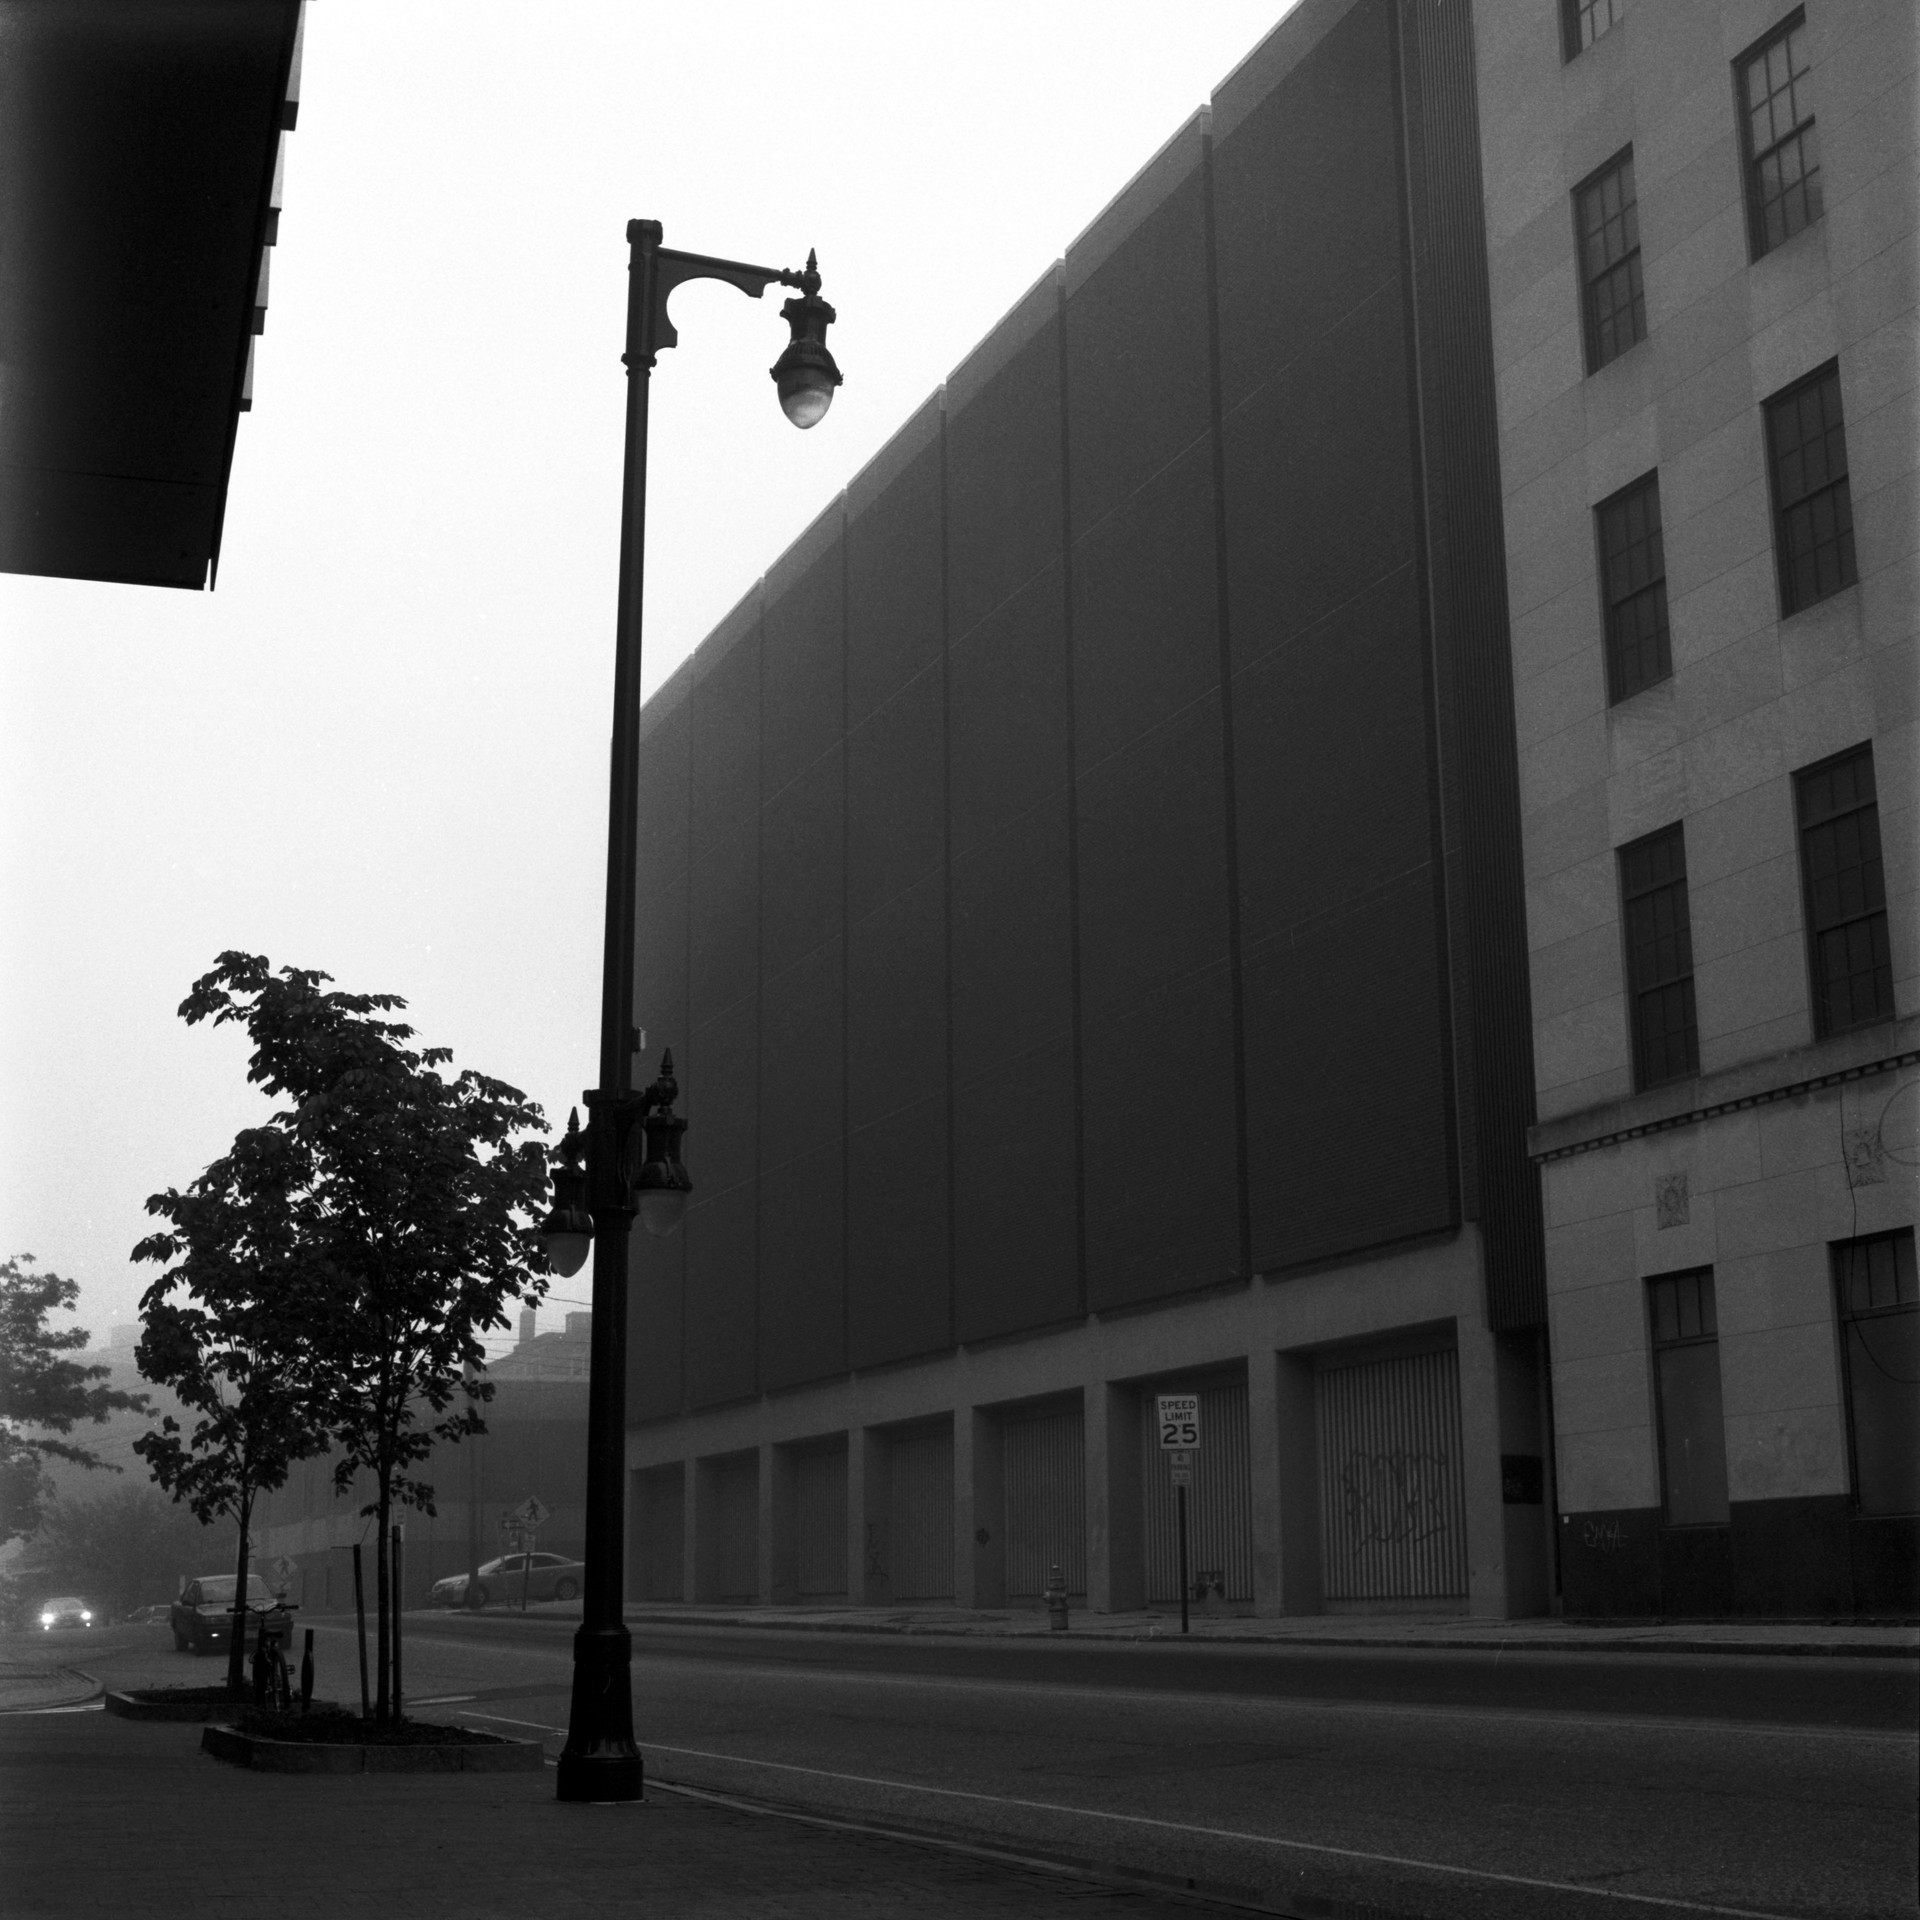 cumberland fog